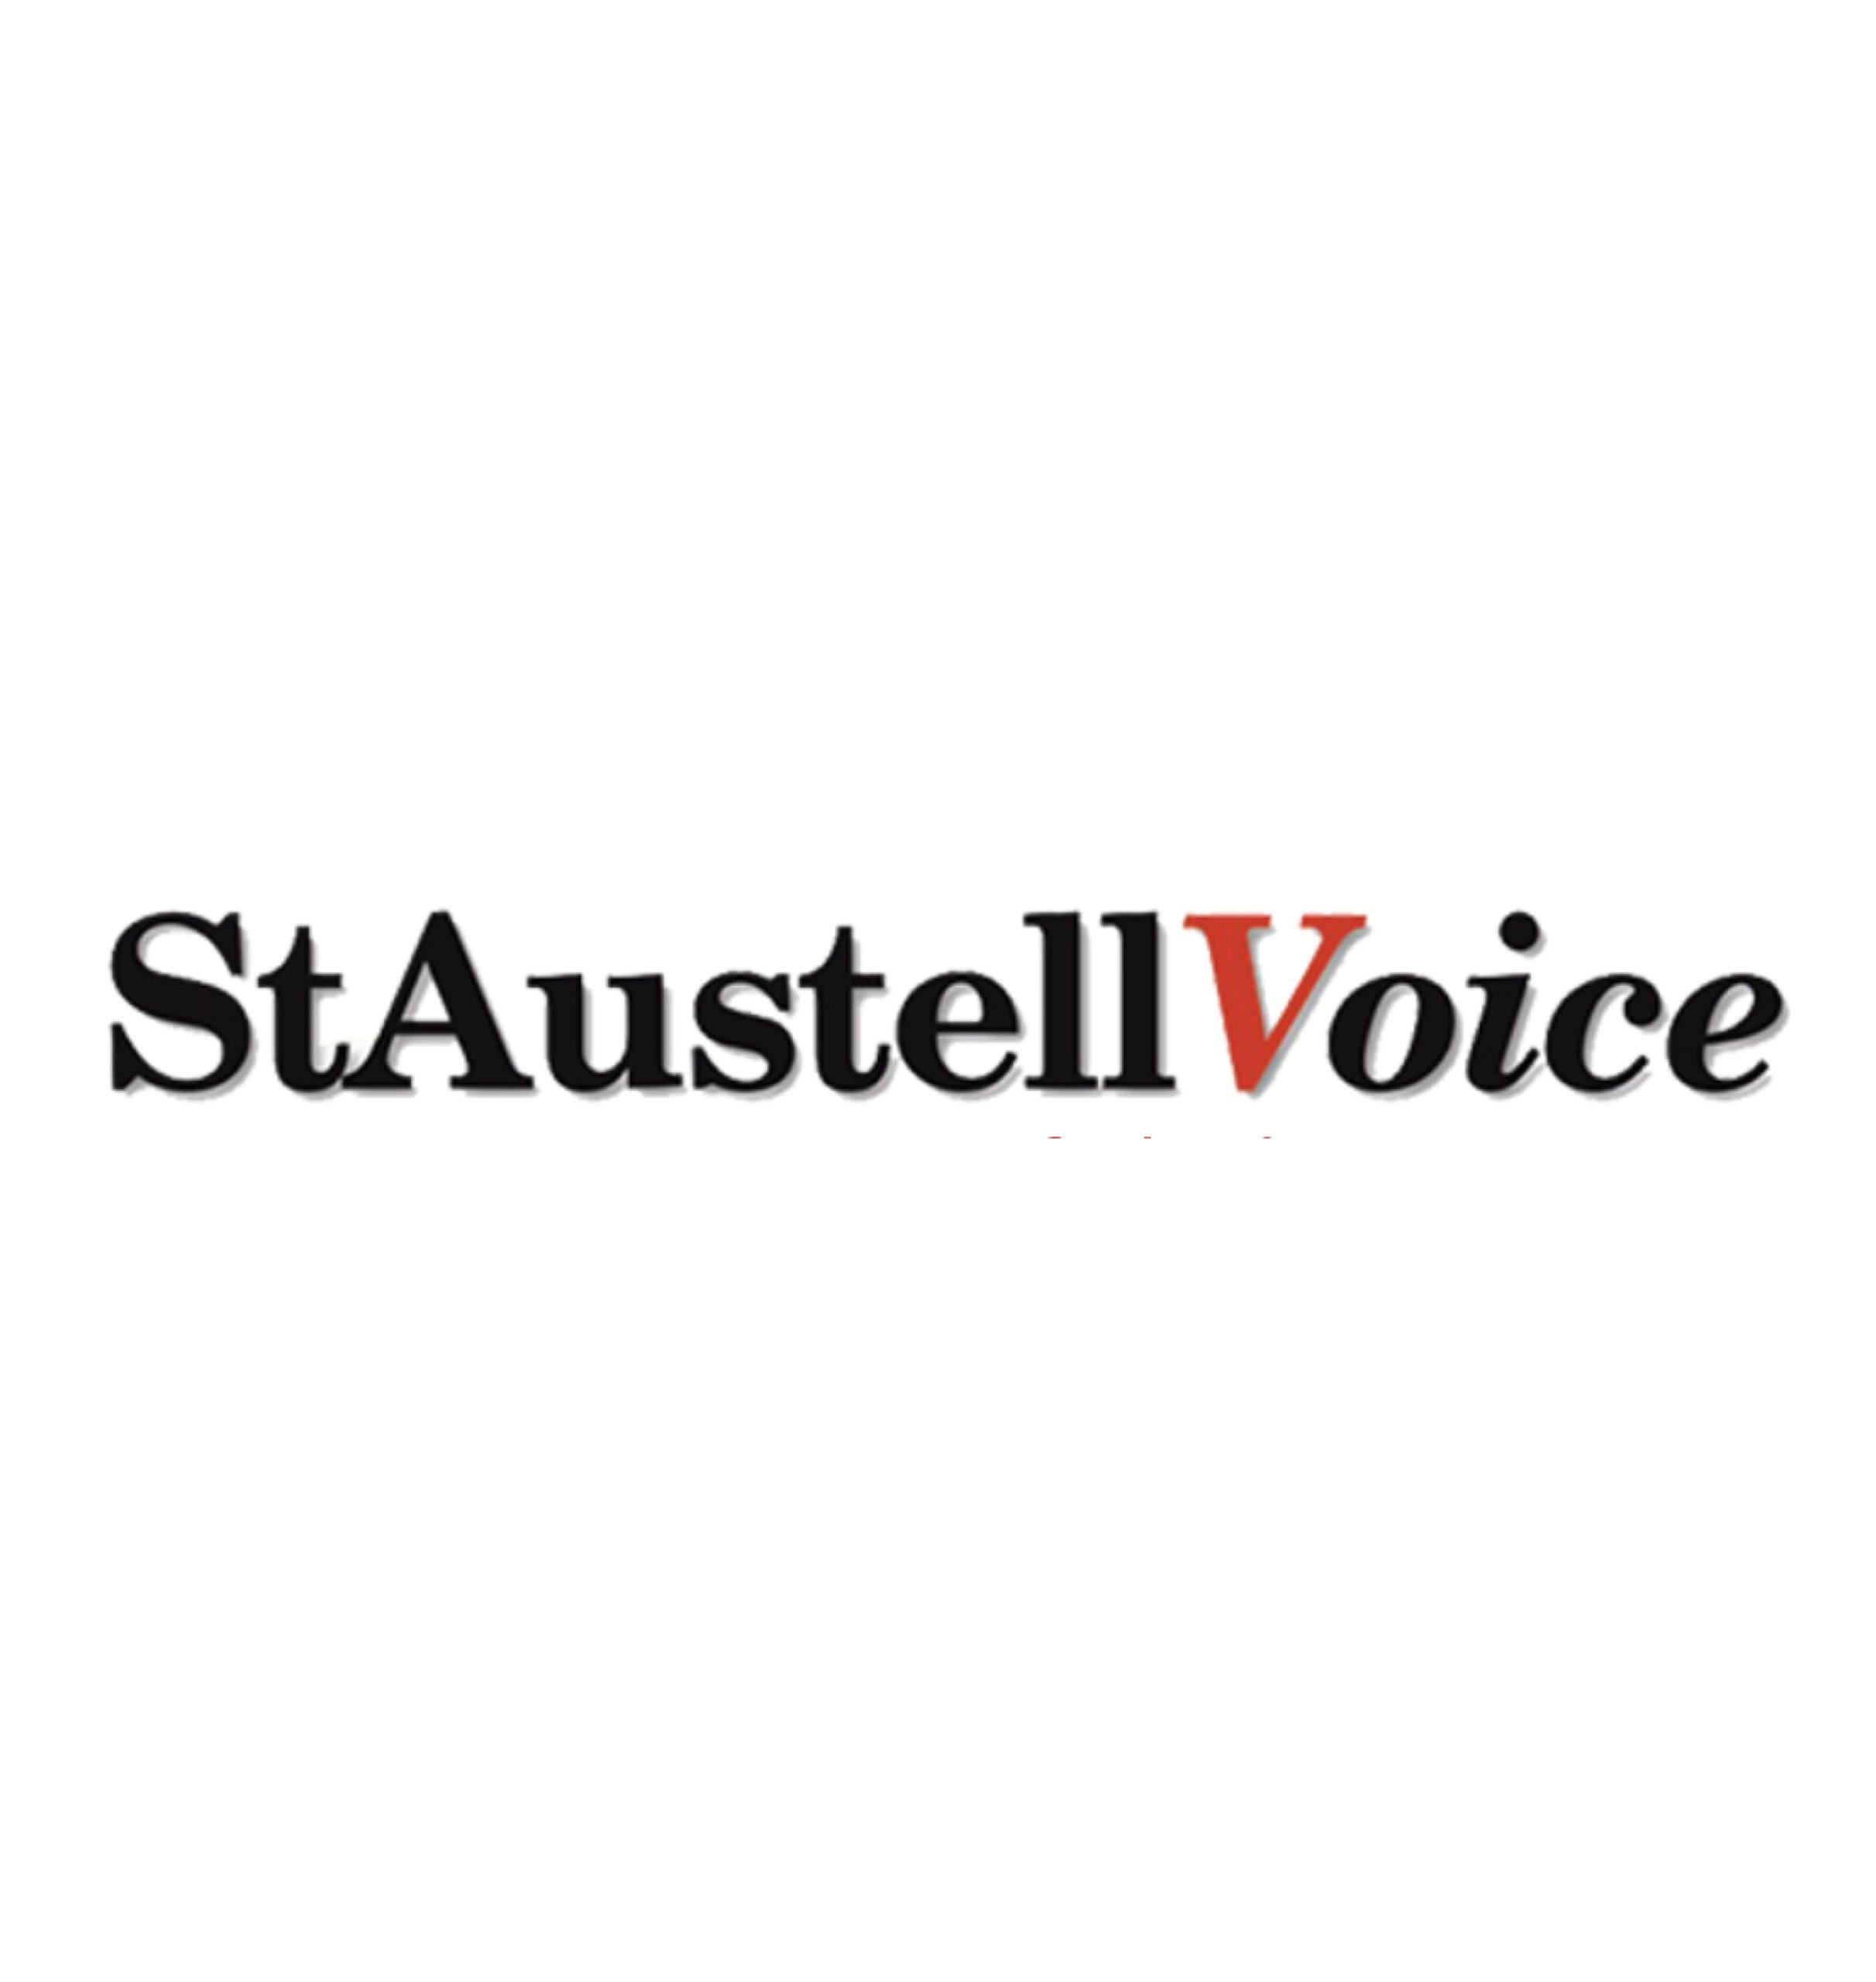 St Austell Voice Logo